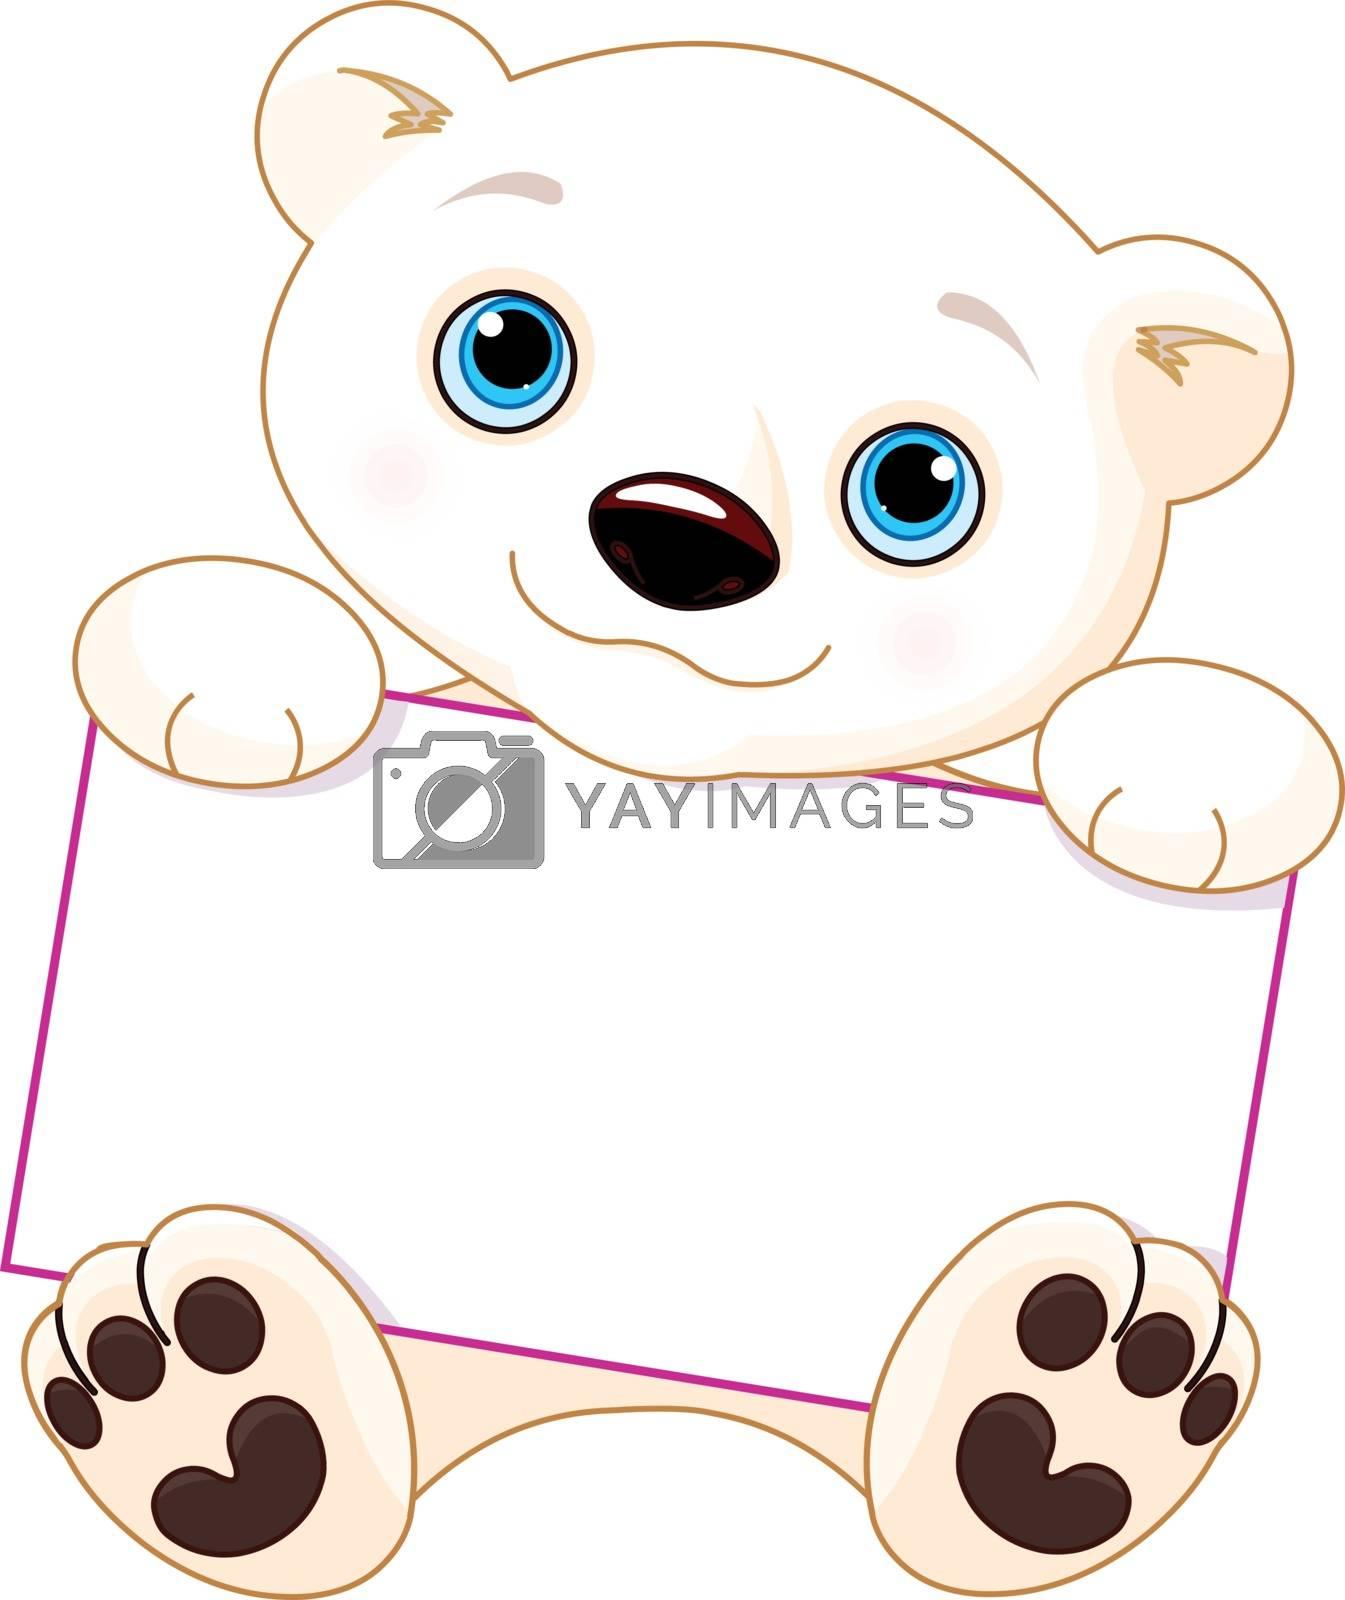 Royalty free image of Polar bear sign by Dazdraperma